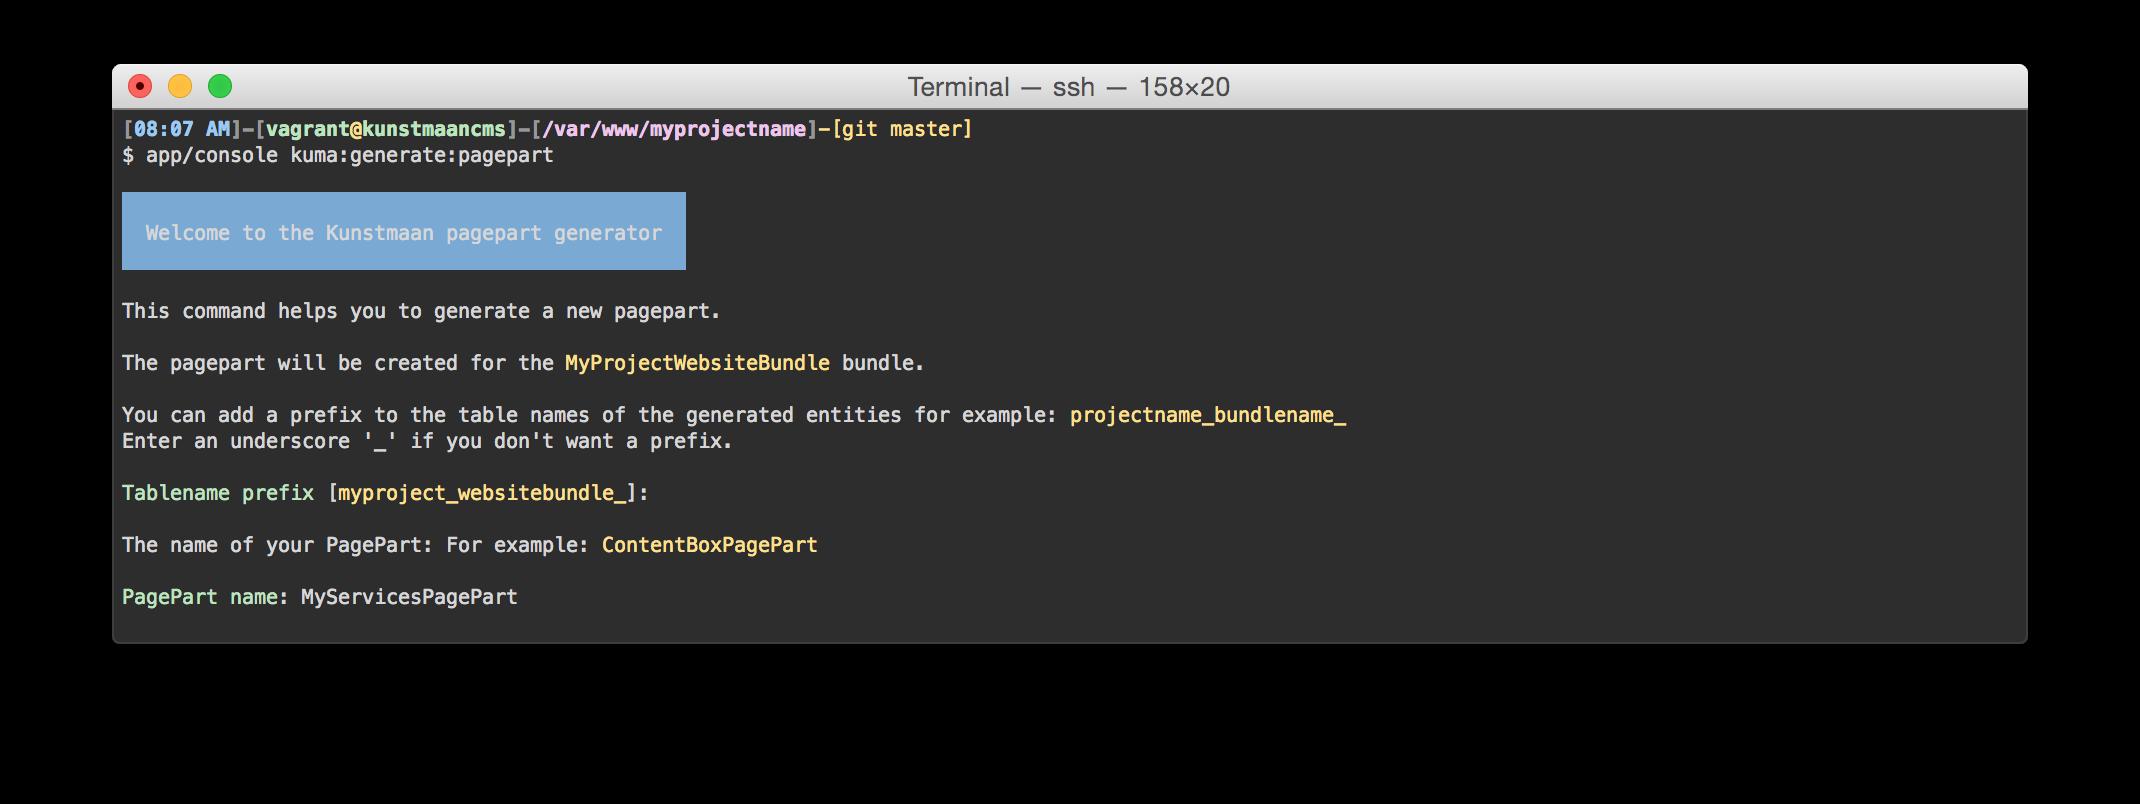 app/console kuma:generate:pagepart